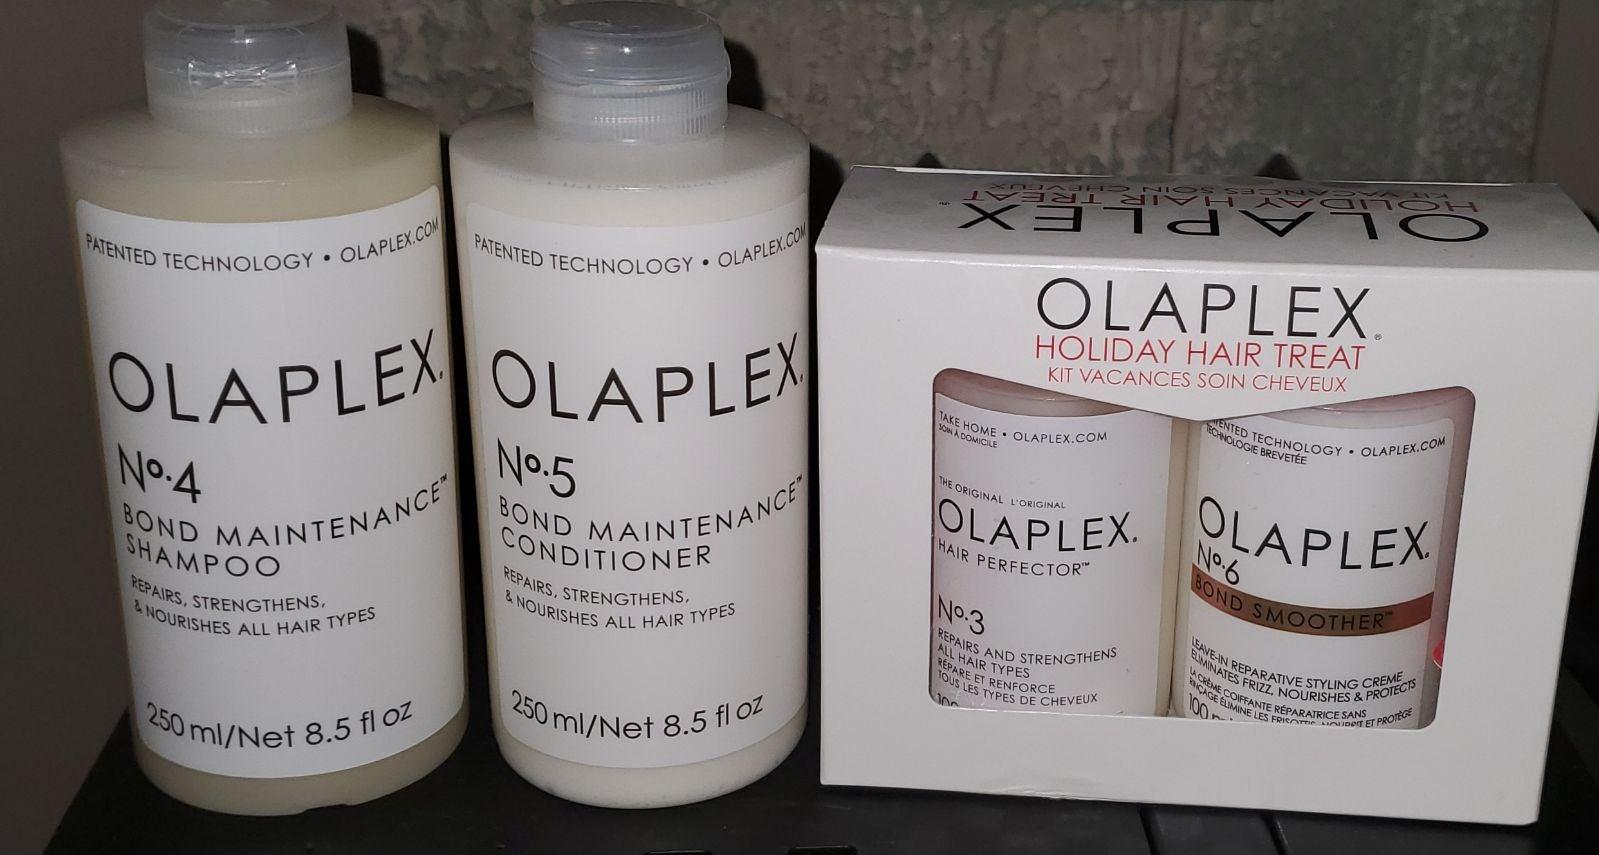 Olaplex‼️Set of FOUR: 3, 4, 5 & 6 SEALED